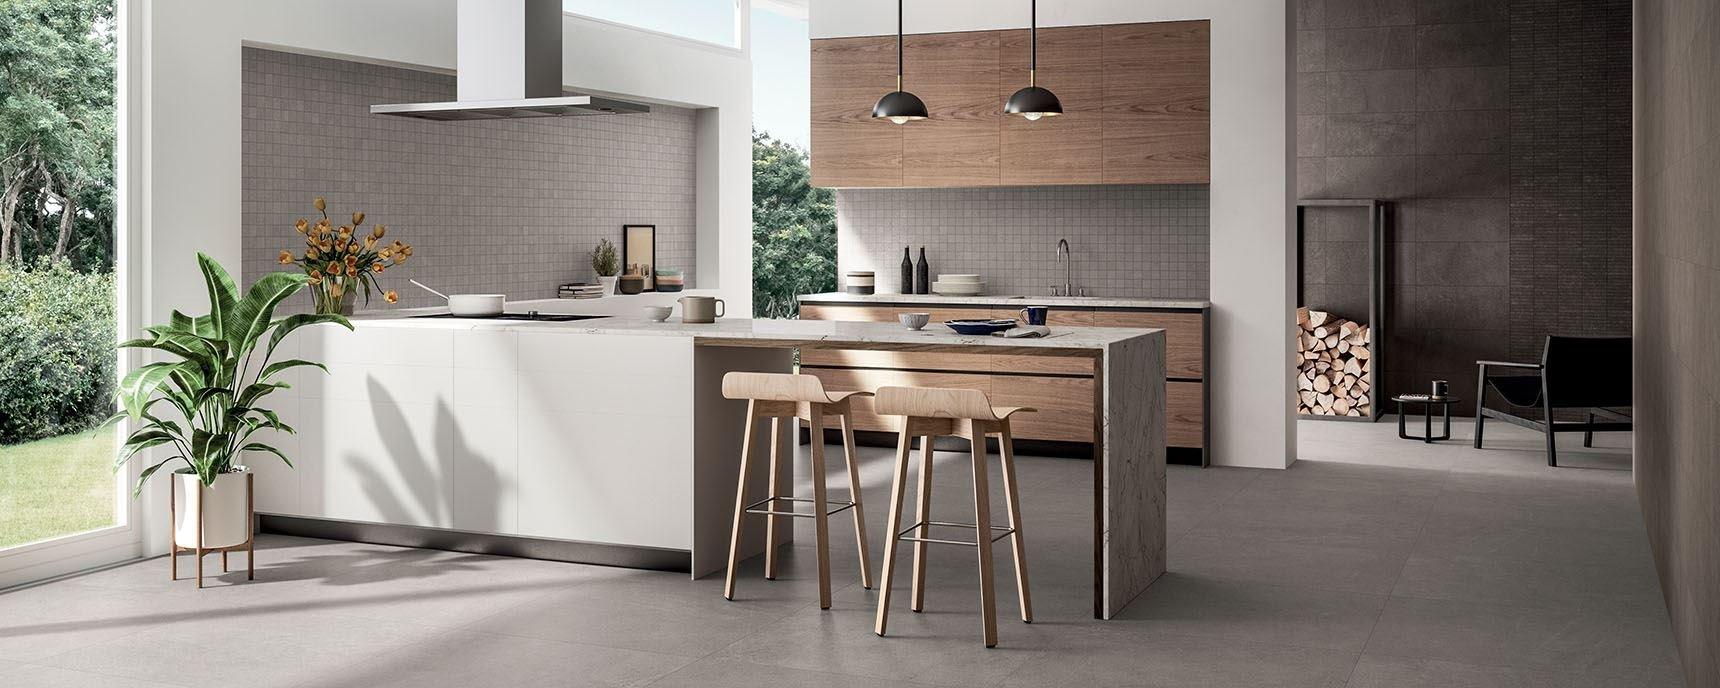 Cucina moderna: come caratterizzarla? | Panaria Ceramica